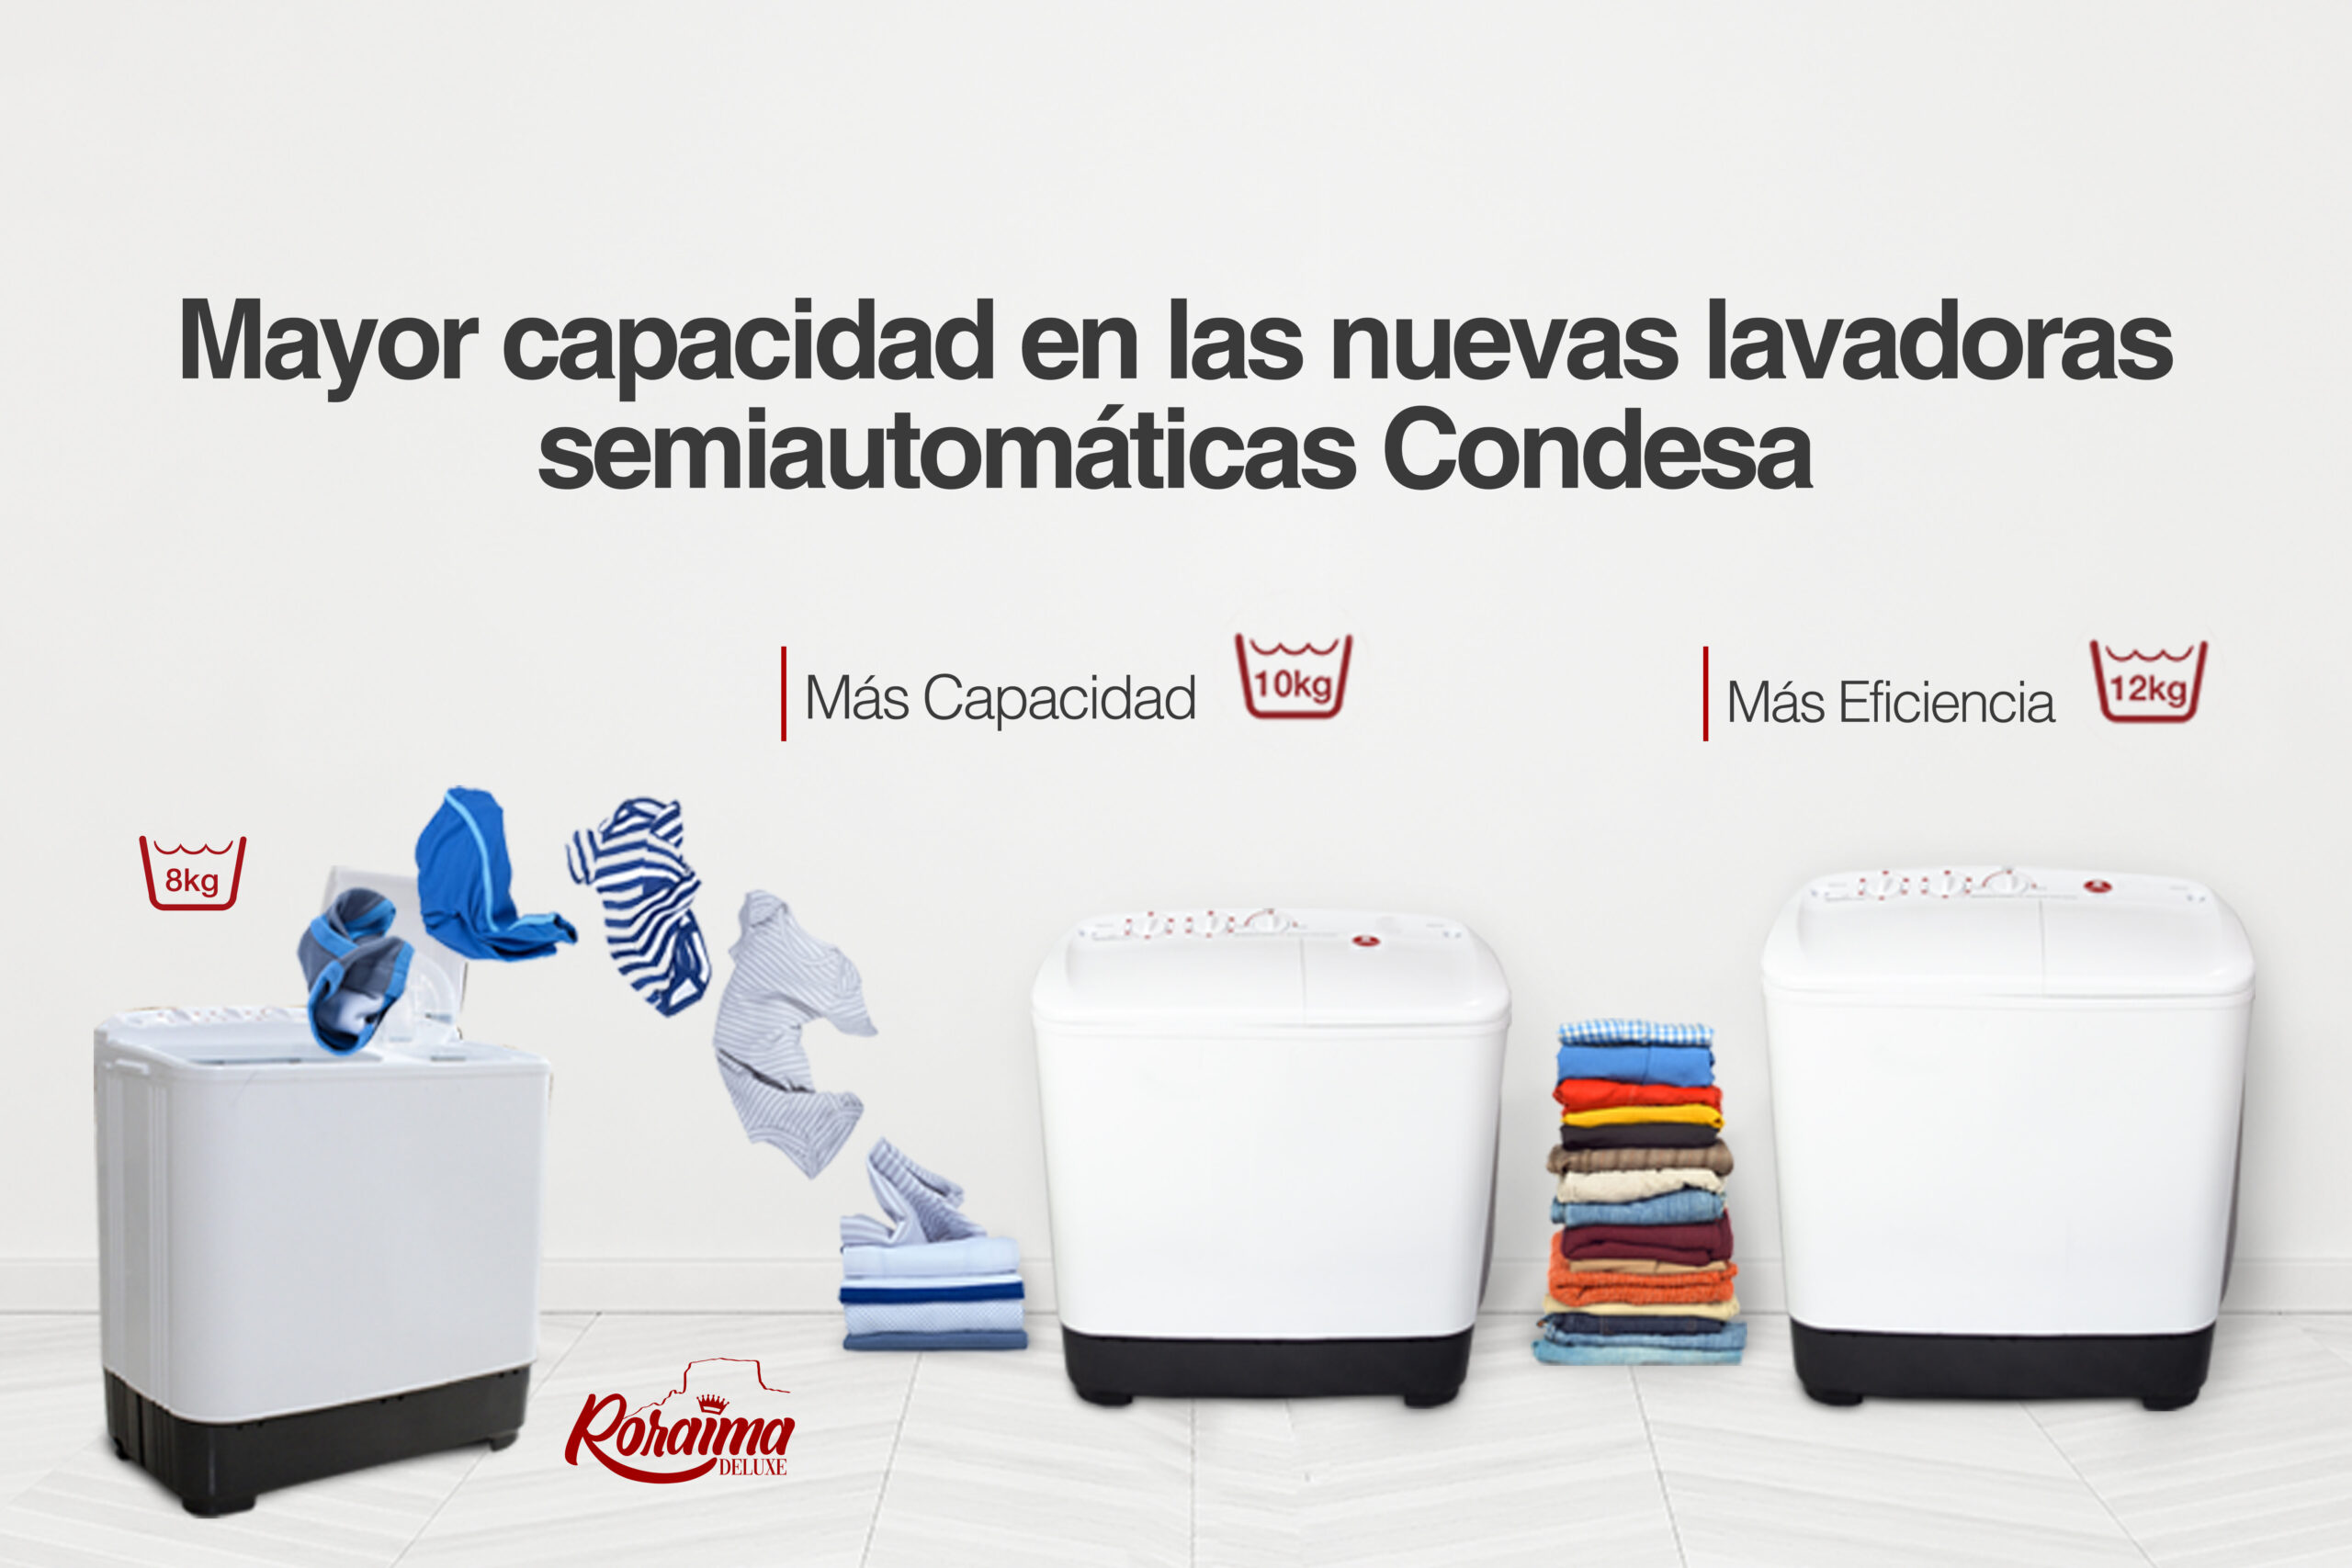 lavadora_marca_condesa_semiautomatica